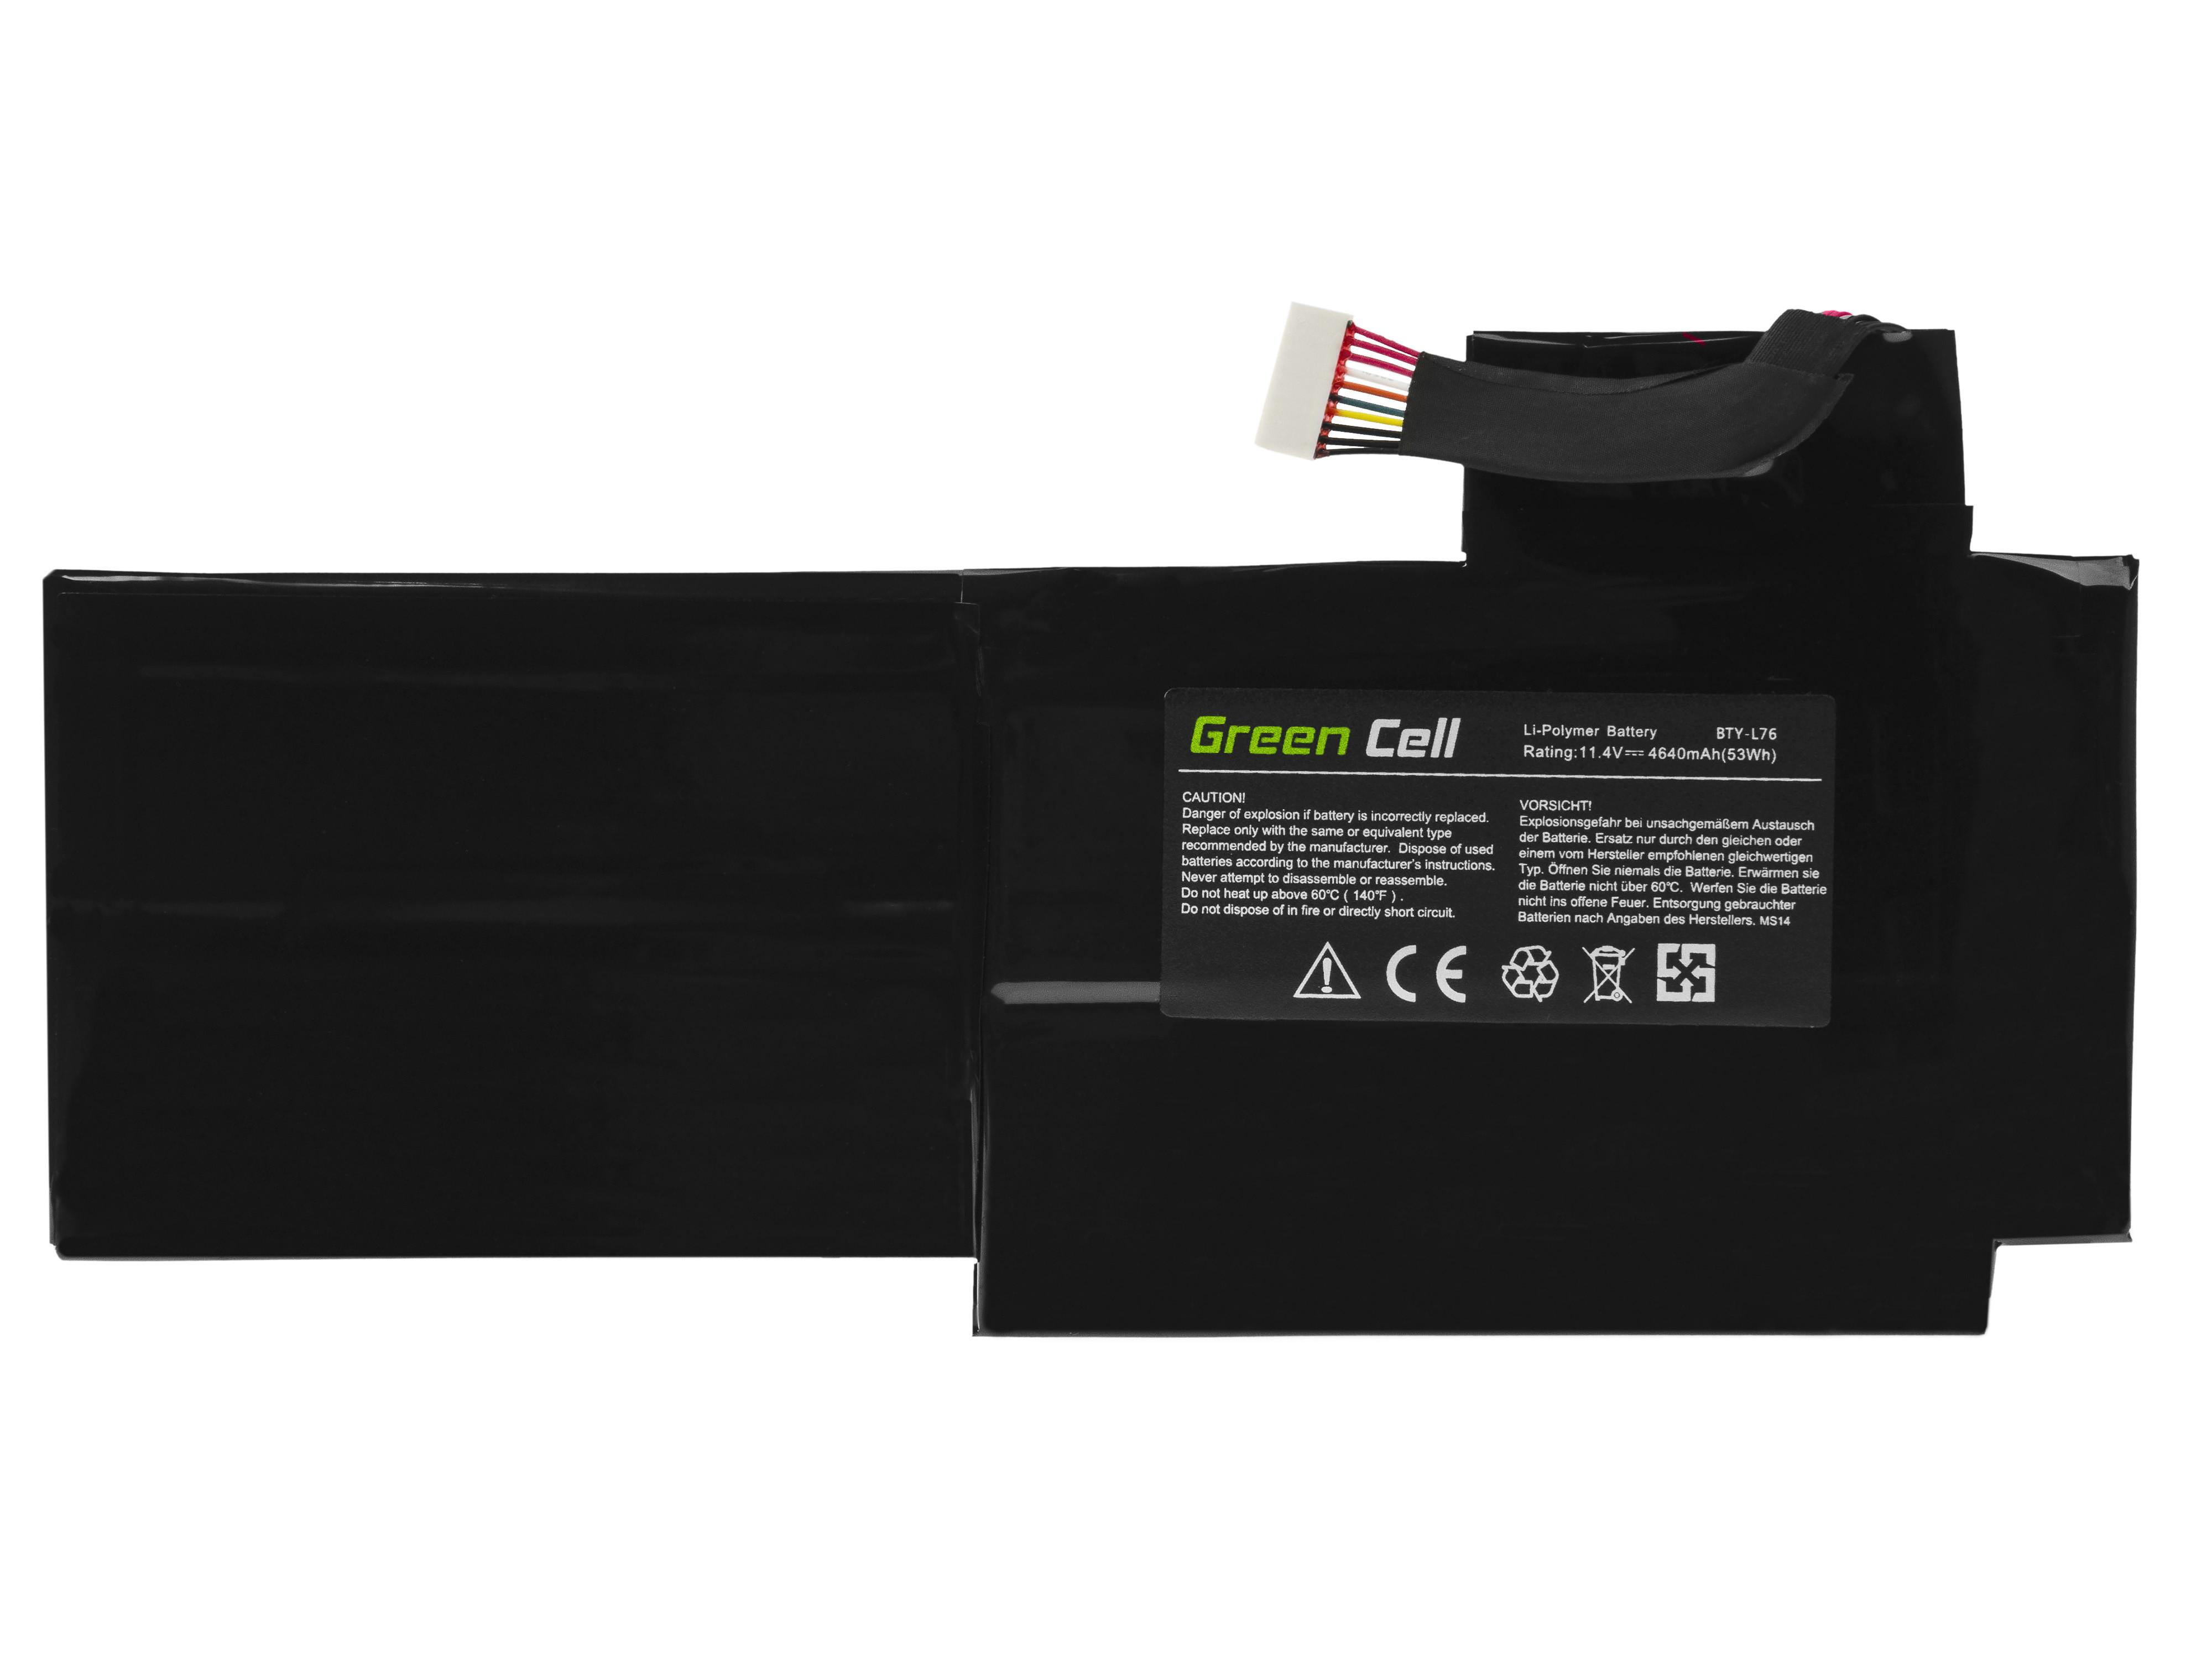 Green Cell MS14 Baterie MSI BTY-L76,MSI GS70 GS72 WS72 4640mAh Li-Pol – neoriginální